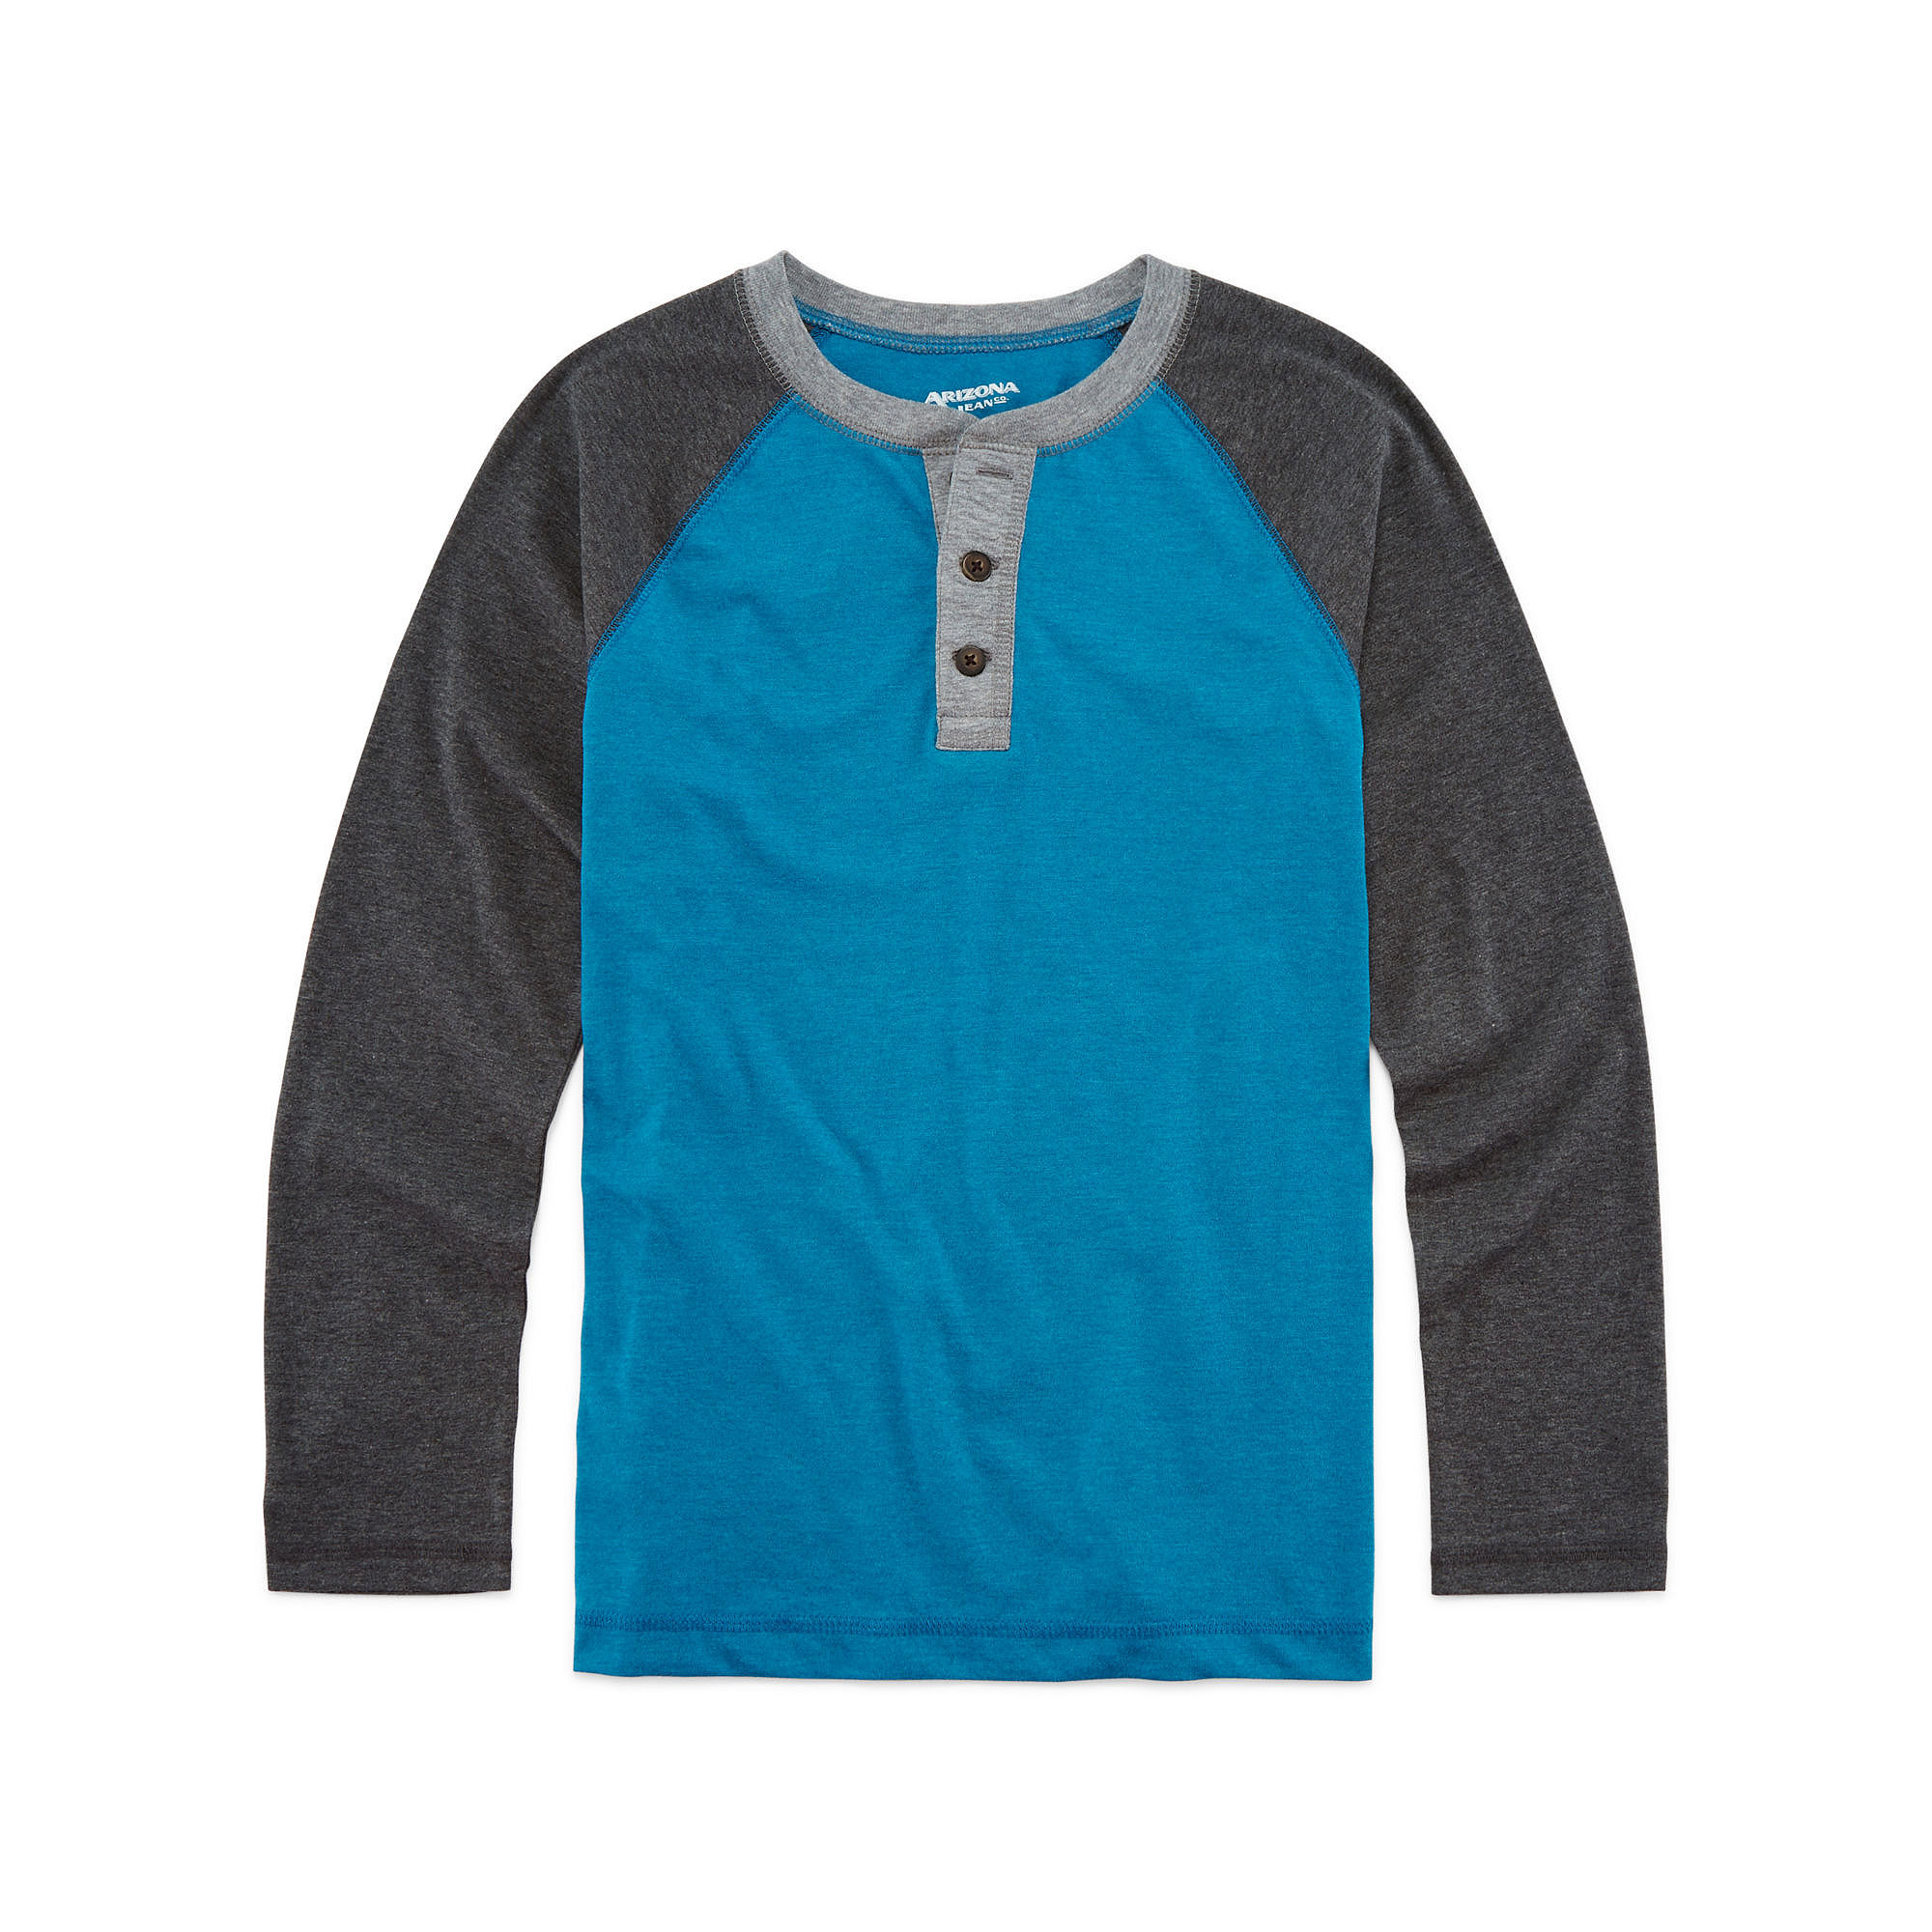 Arizona Long Sleeve Camo Henley Tshirt Boys 8 20 and Husky T Shirt | Shirts, Tops and Clothing